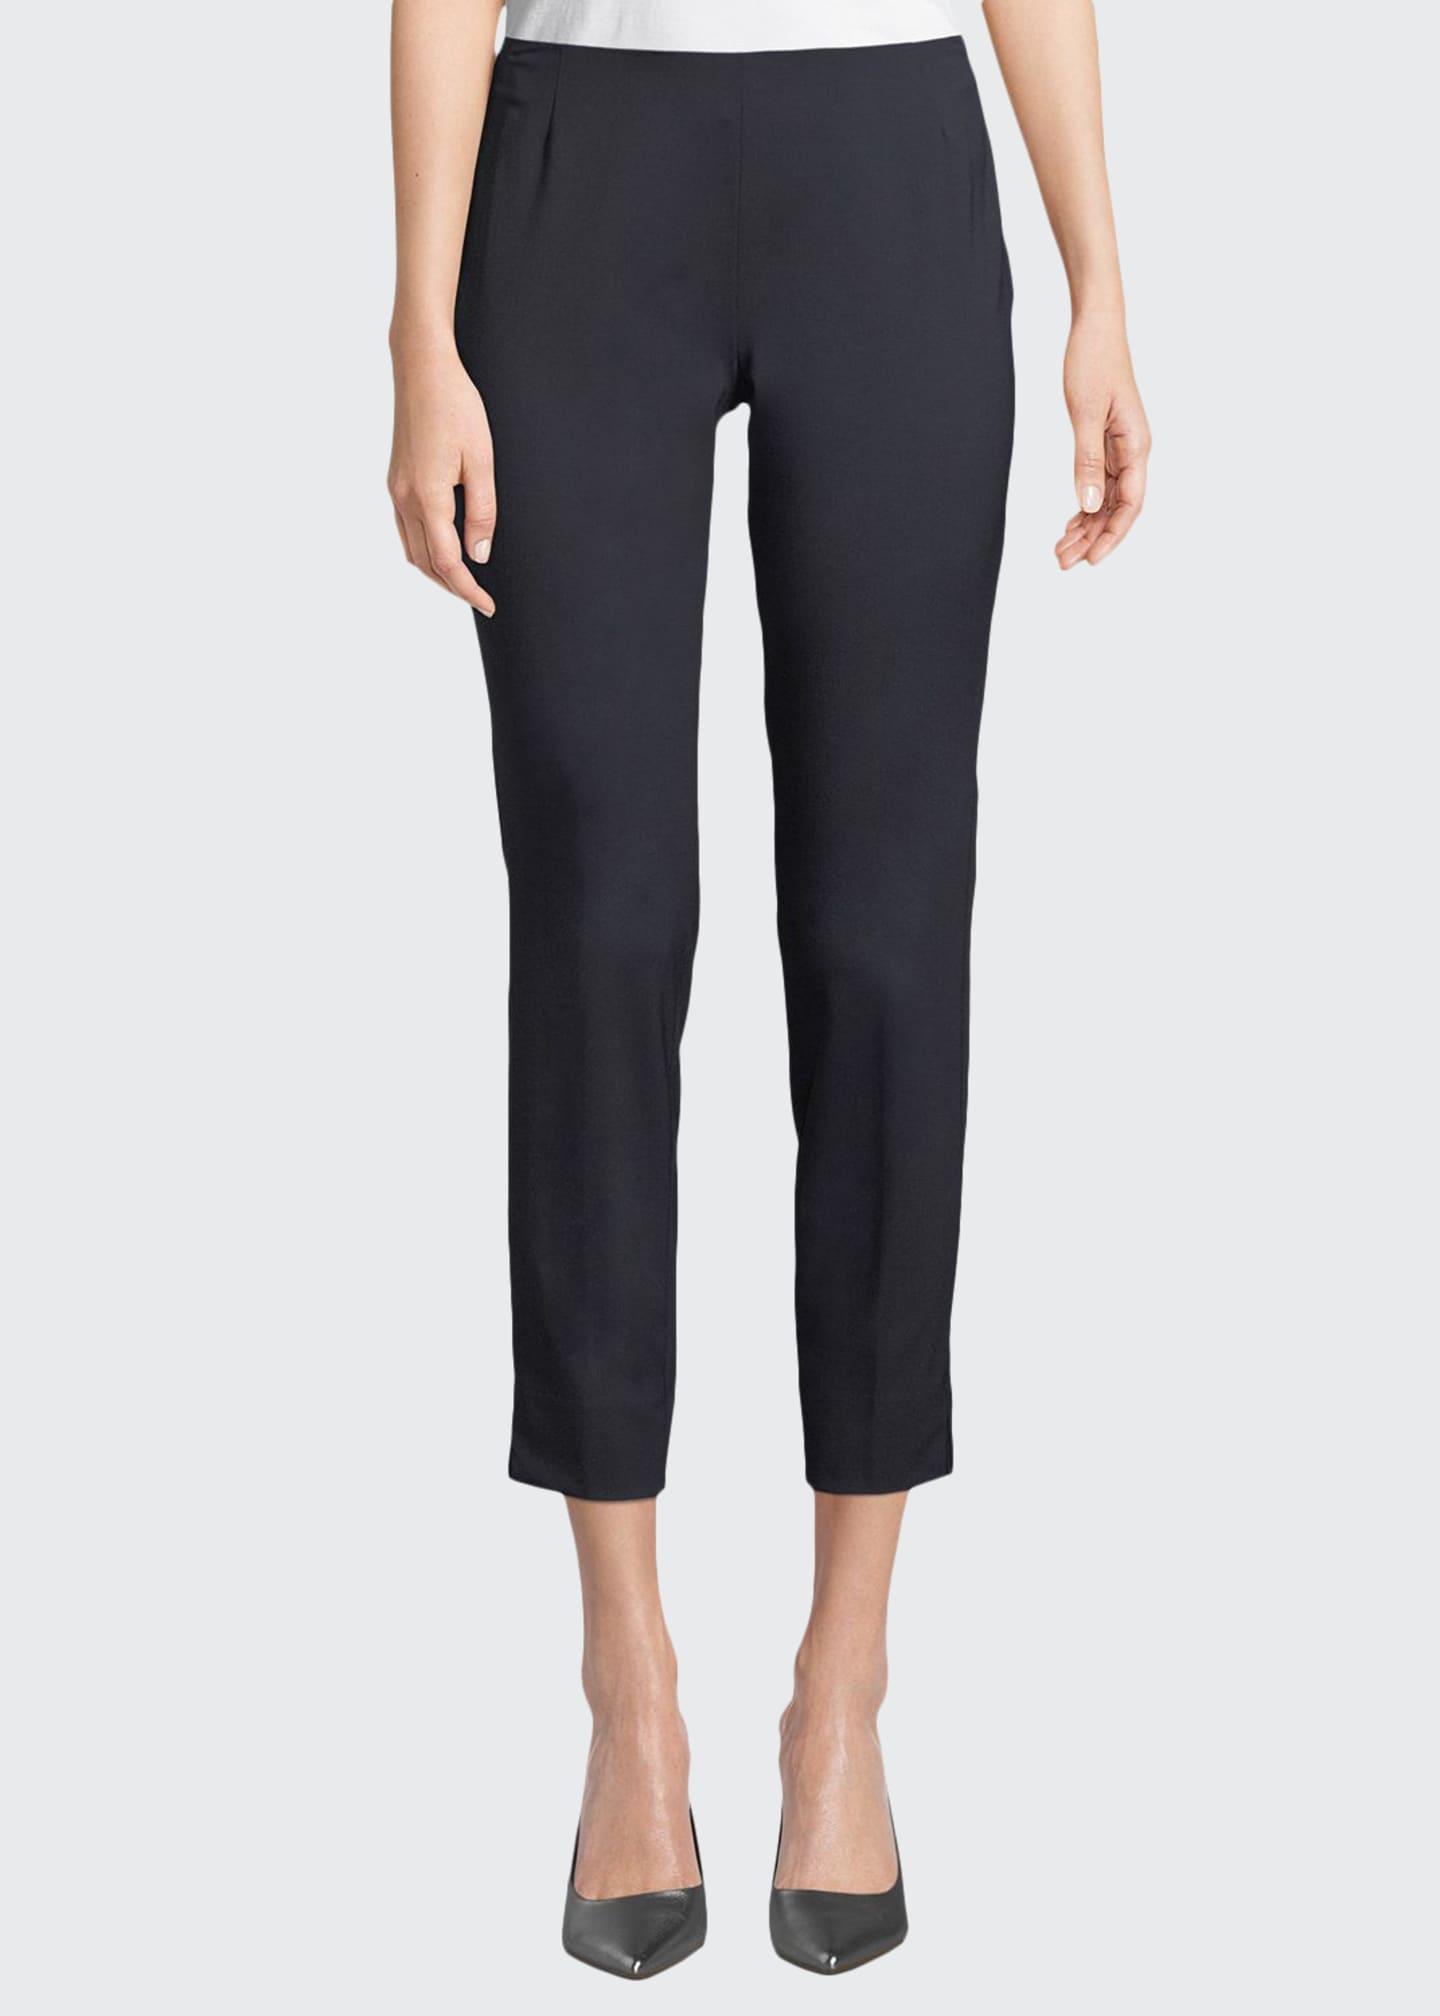 Lafayette 148 New York Stanton Stretch-Wool Pants